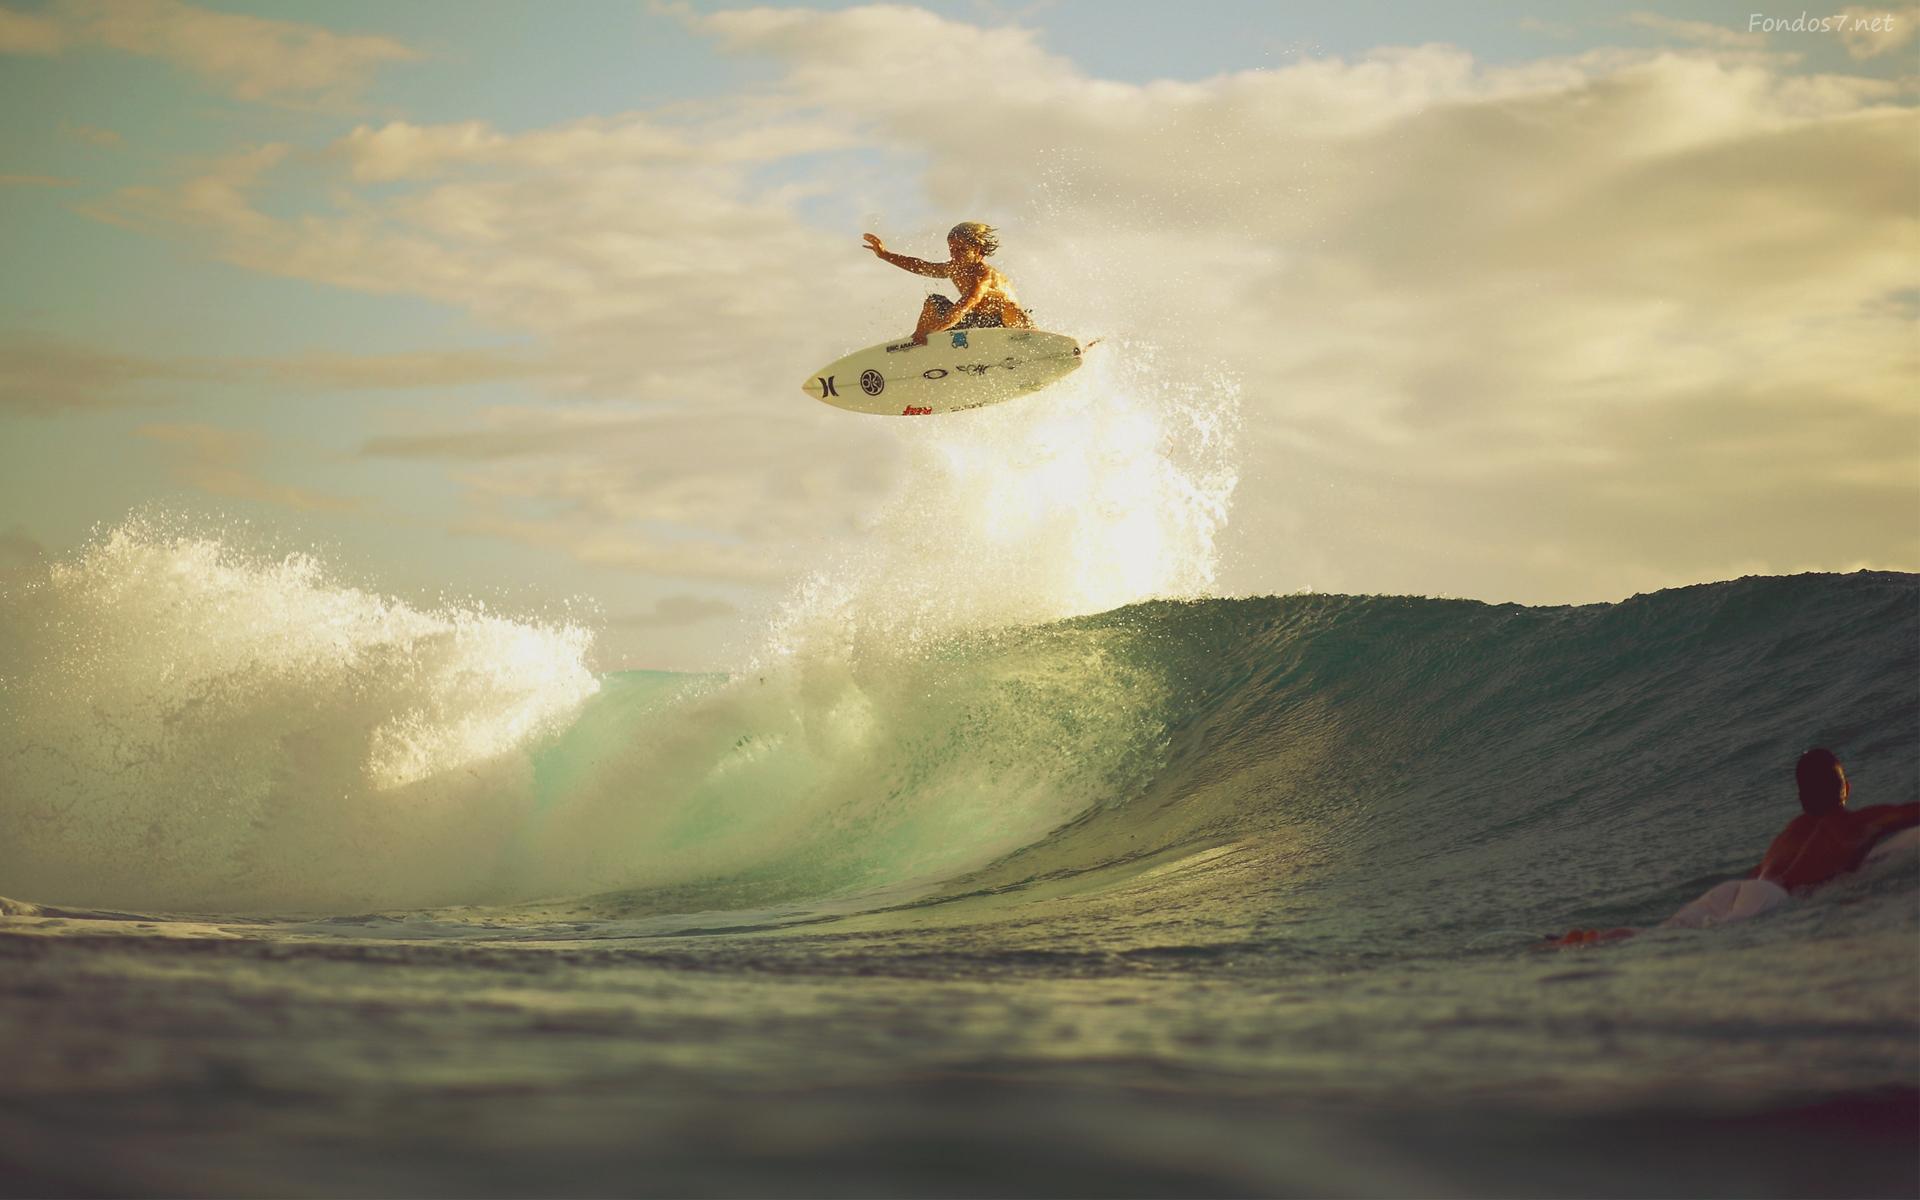 Fondos de pantalla salto de surf hd widescreen Gratis imagenes 6310 1920x1200